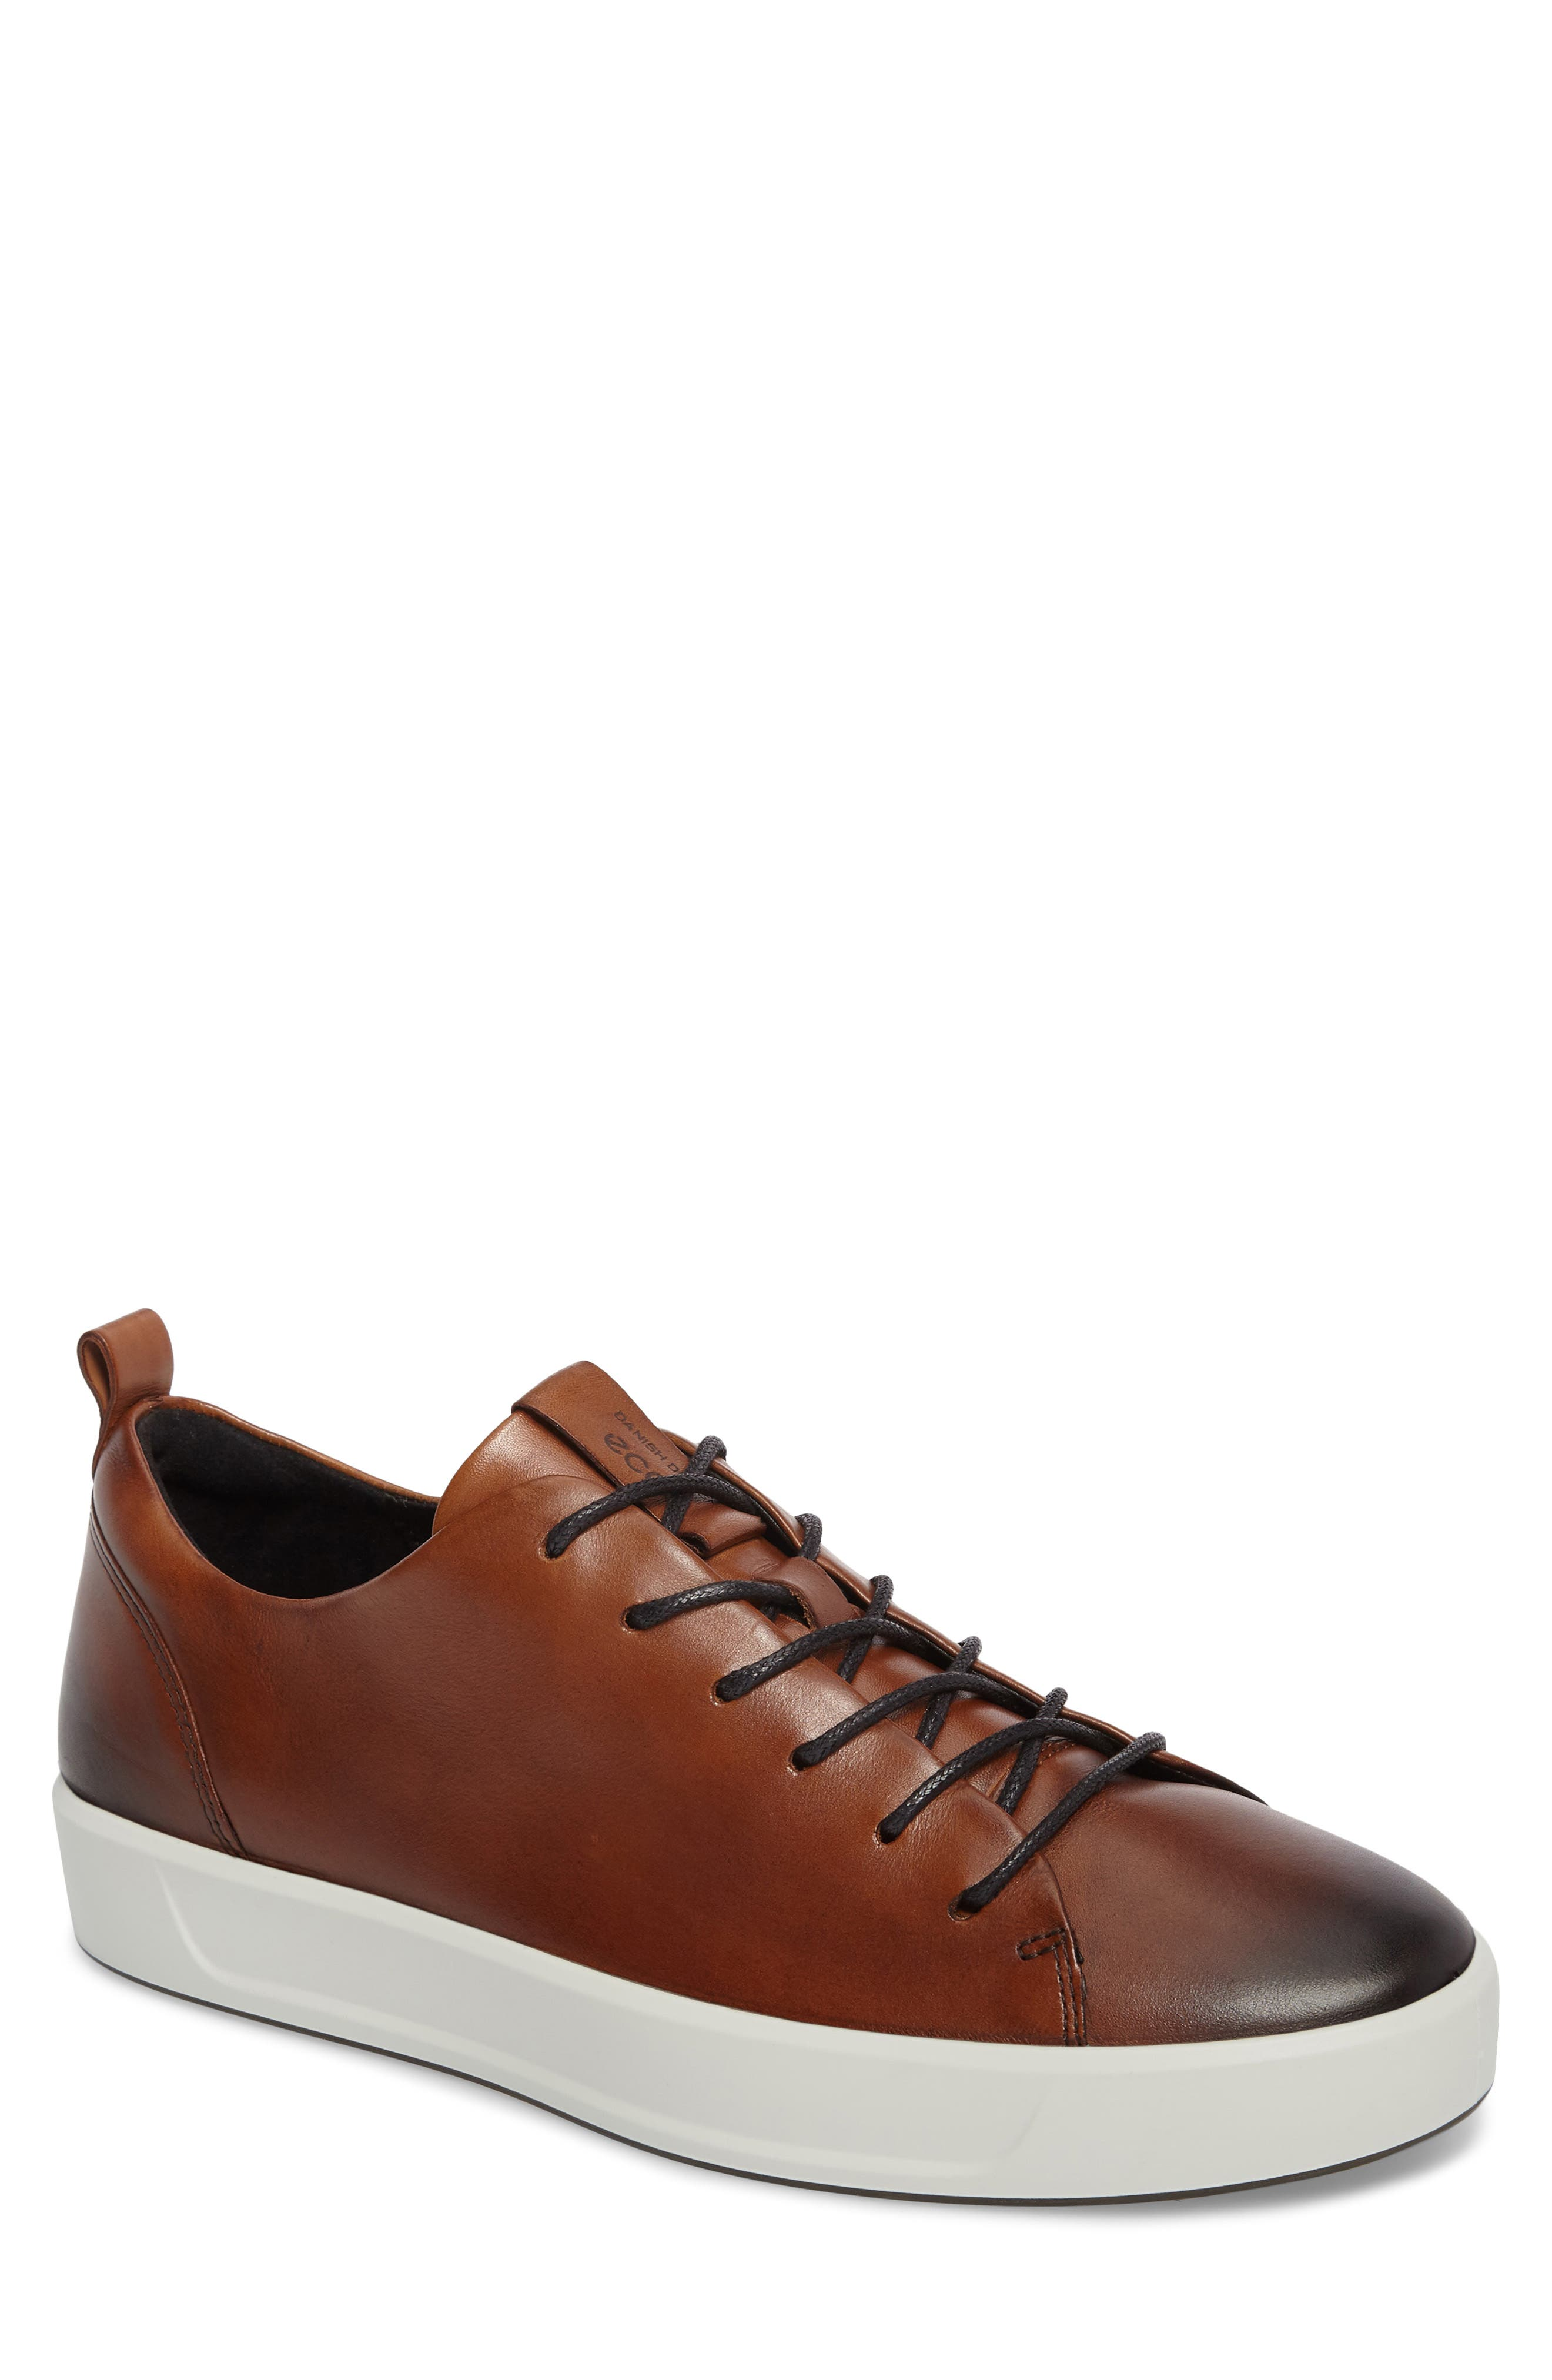 Soft 8 Street Sneaker,                             Main thumbnail 1, color,                             LION